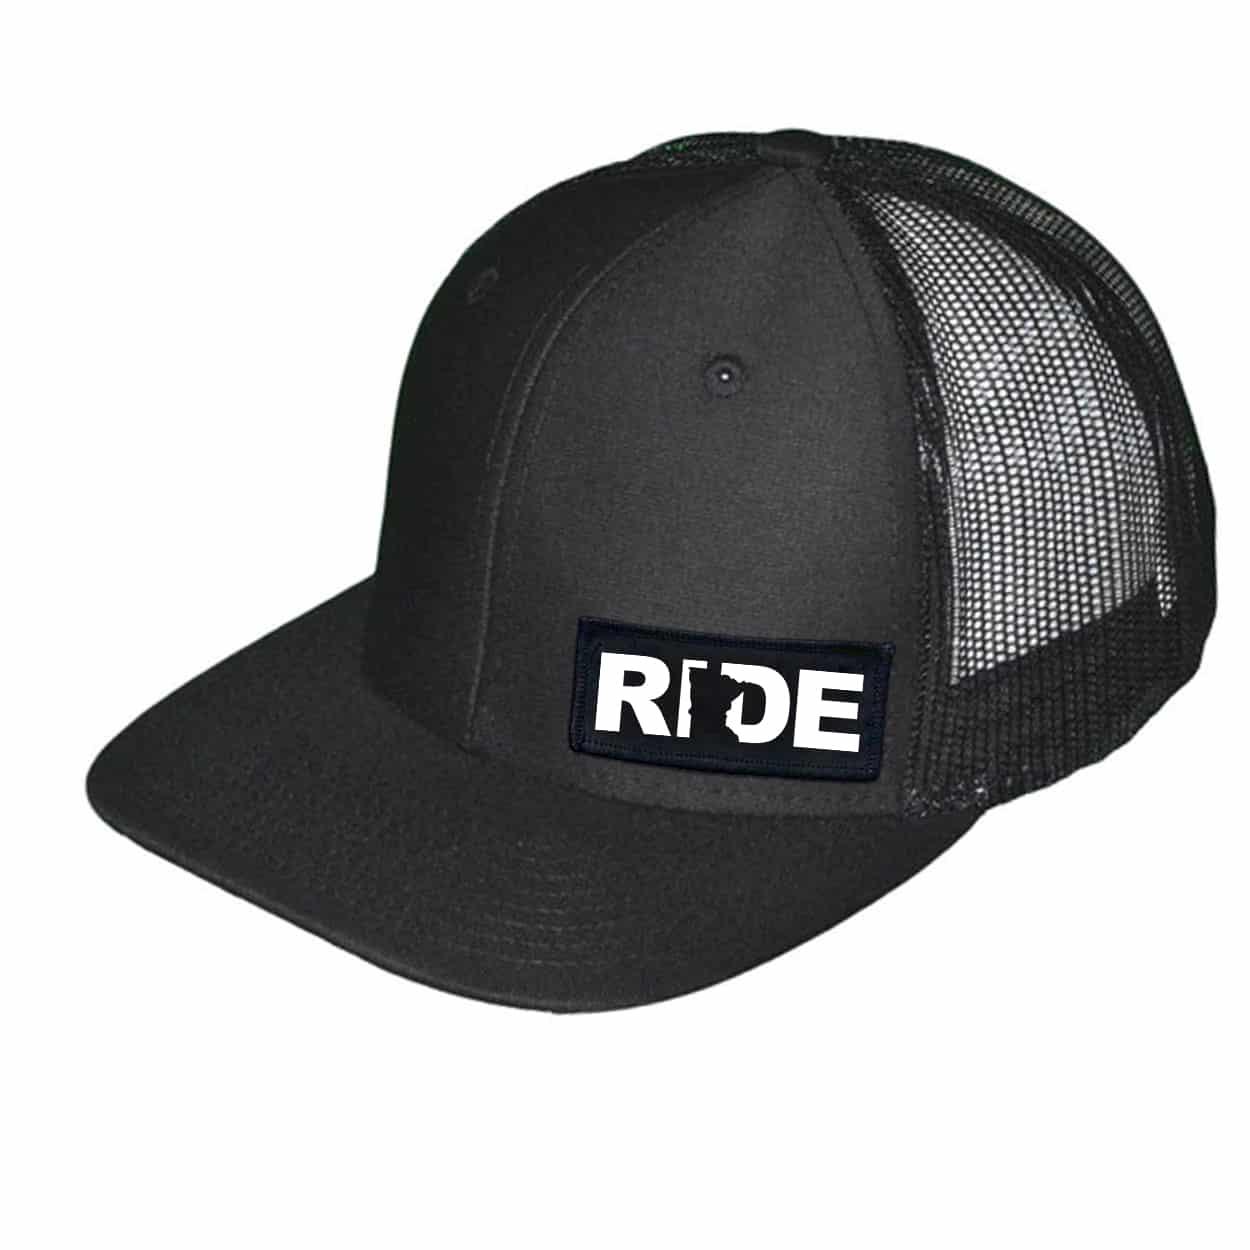 Ride Minnesota Night Out Woven Patch Snapback Trucker Hat Black (White Logo)